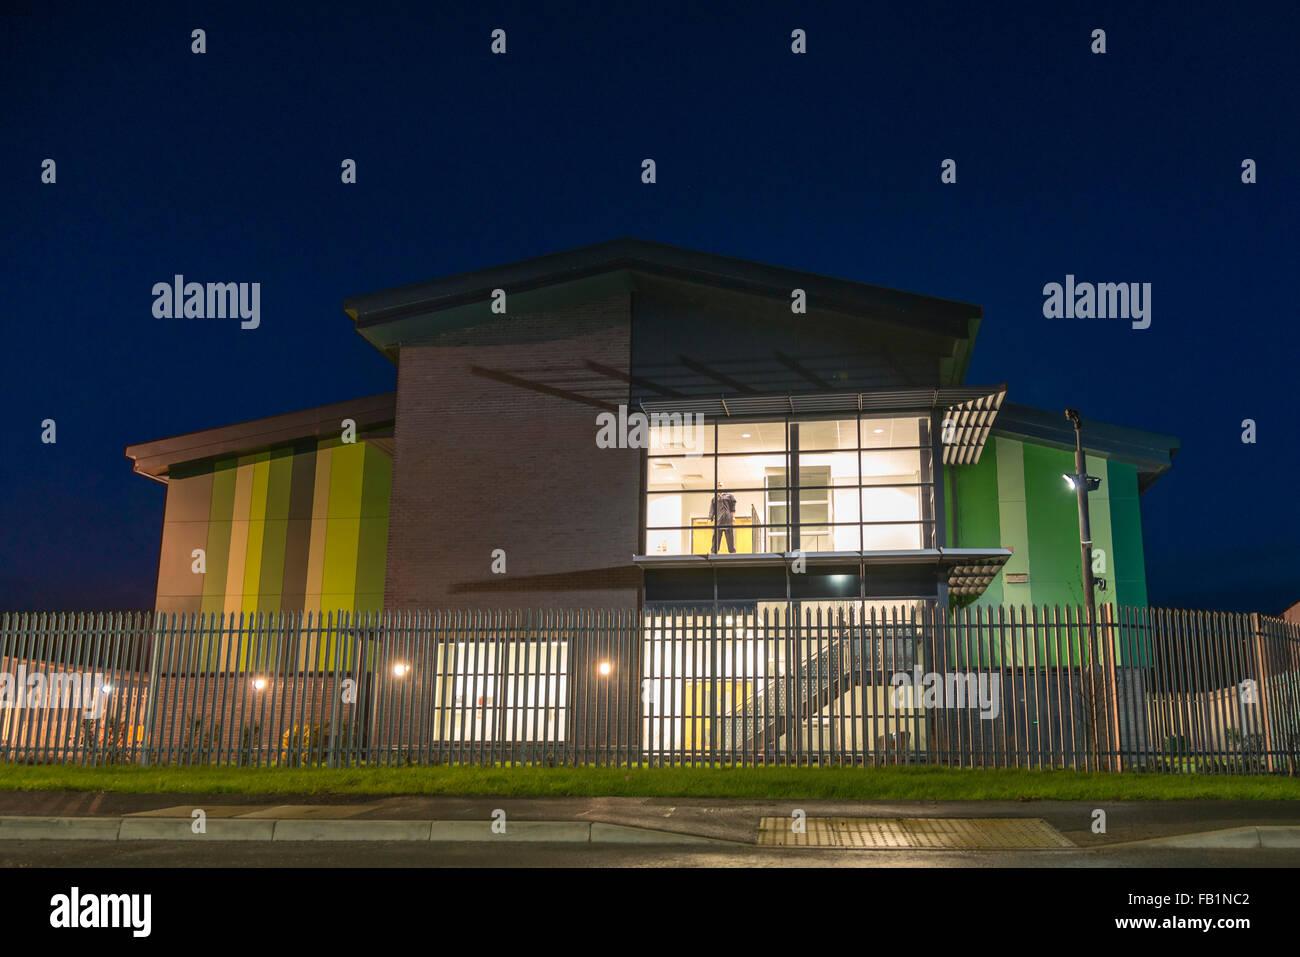 Commercial real estate industrial unit exterior taken at dusk, UK. Mannequin at window. - Stock Image